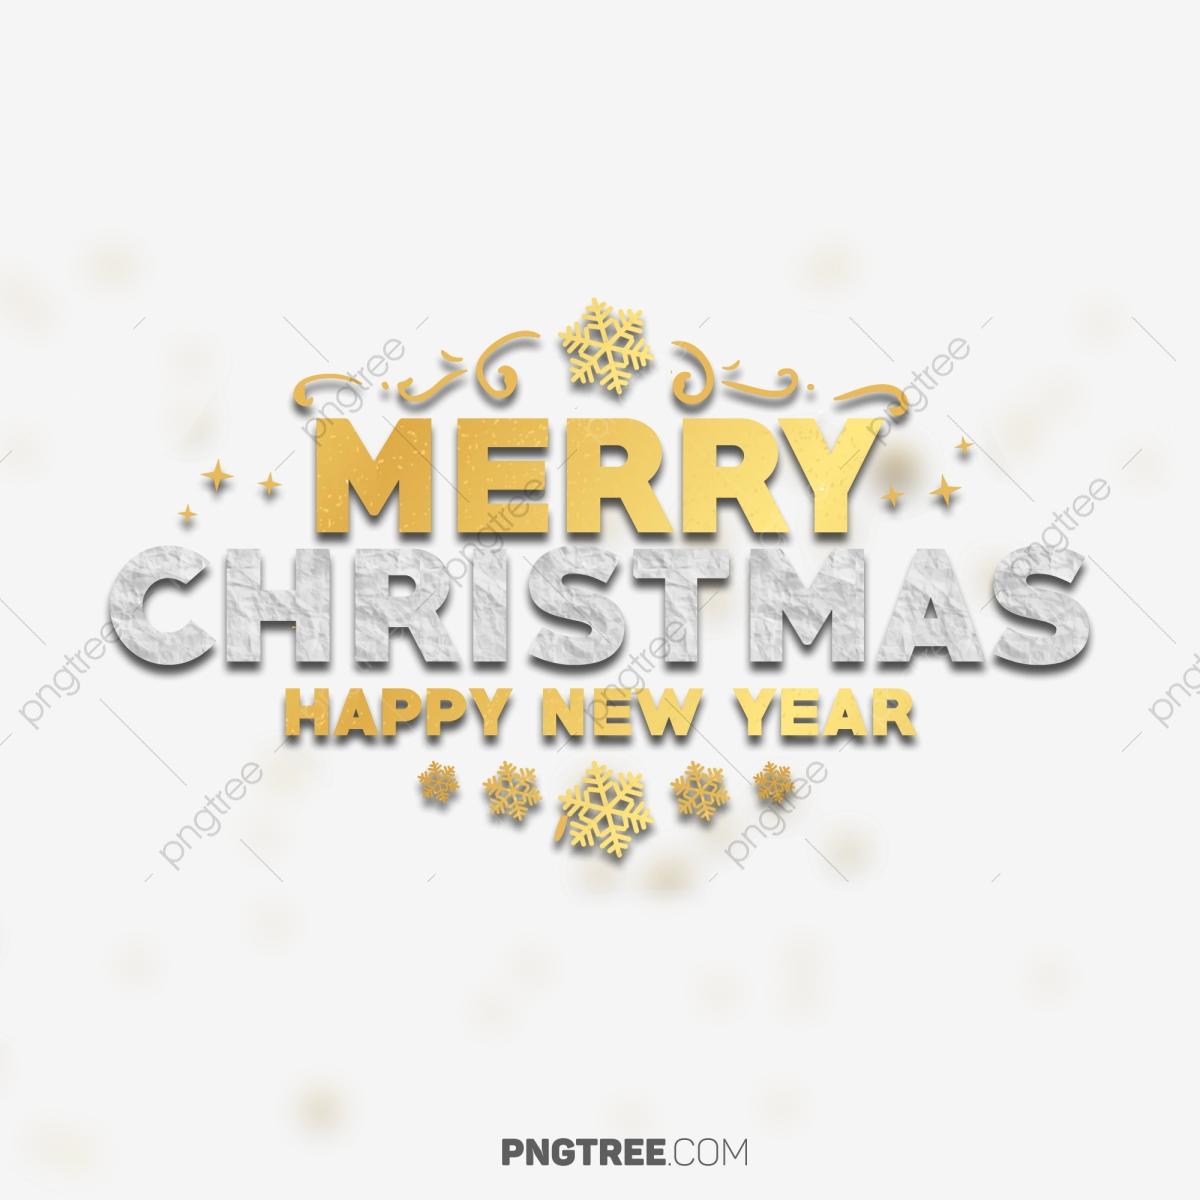 It Christmas Merr Christmas.Beautiful Merry Christmas Transparent Design Christmas Eve